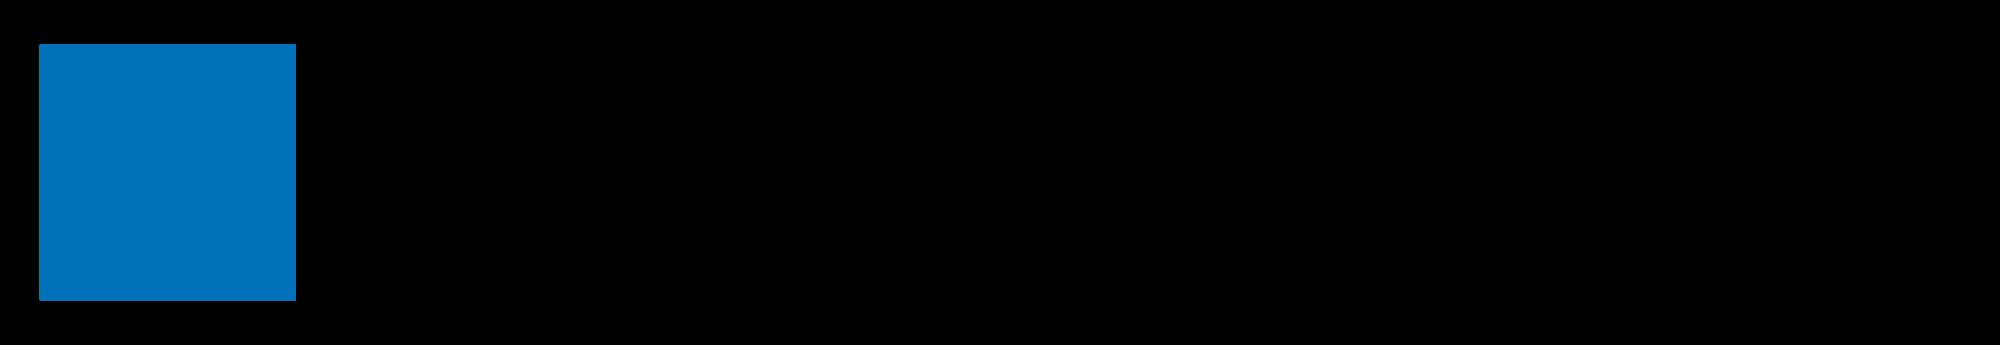 Geberit монтажная рама для унитаза, биде и раковины